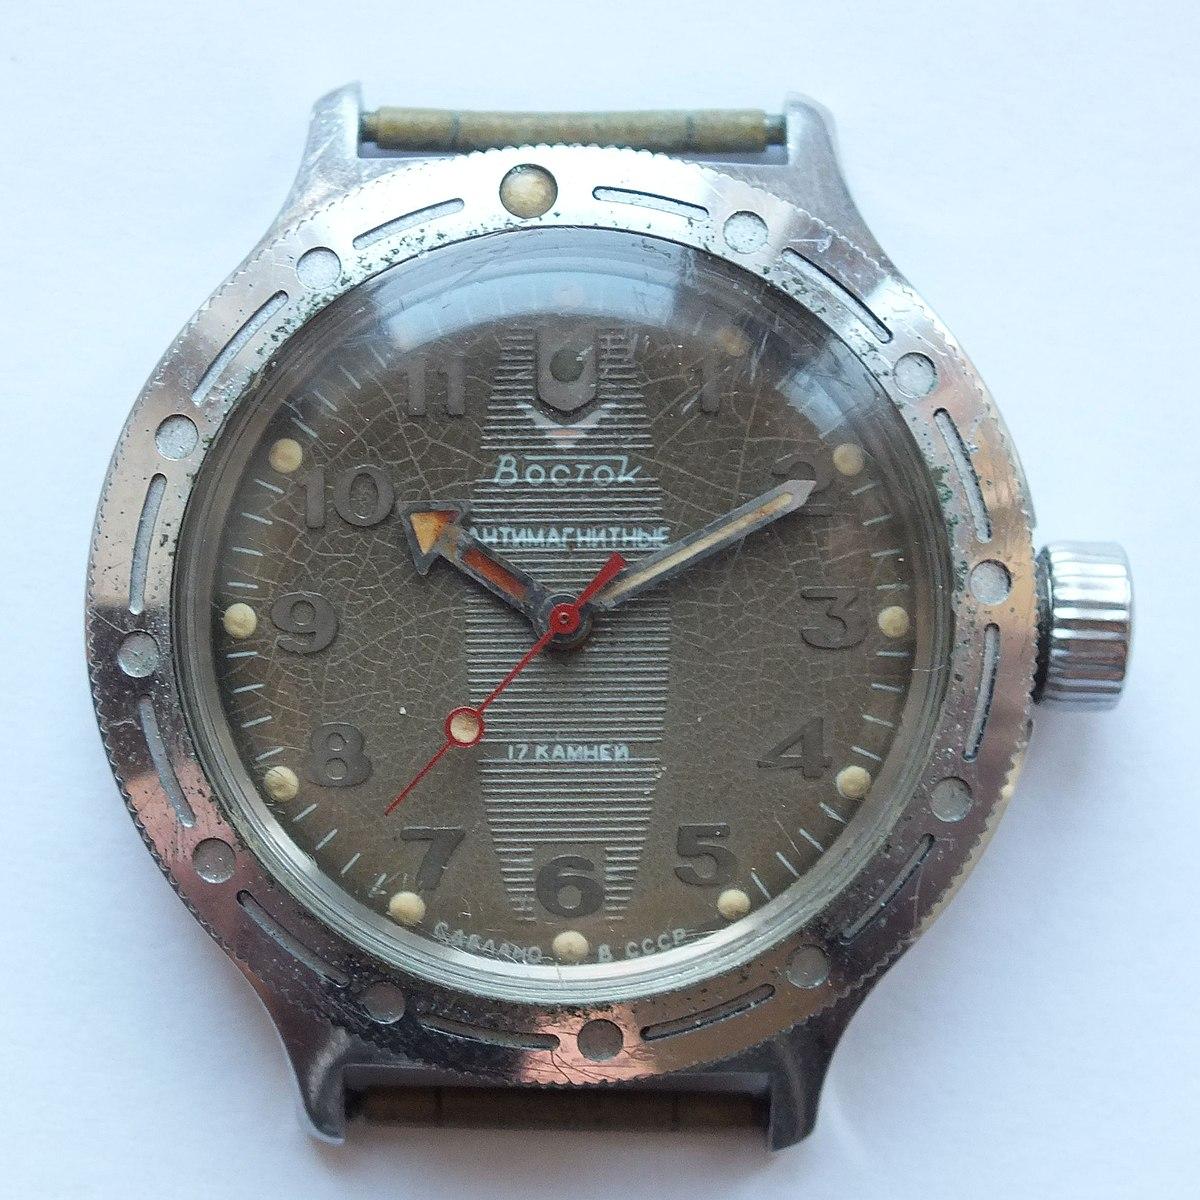 146b4294b1cb Амфибия (часы) — Википедия